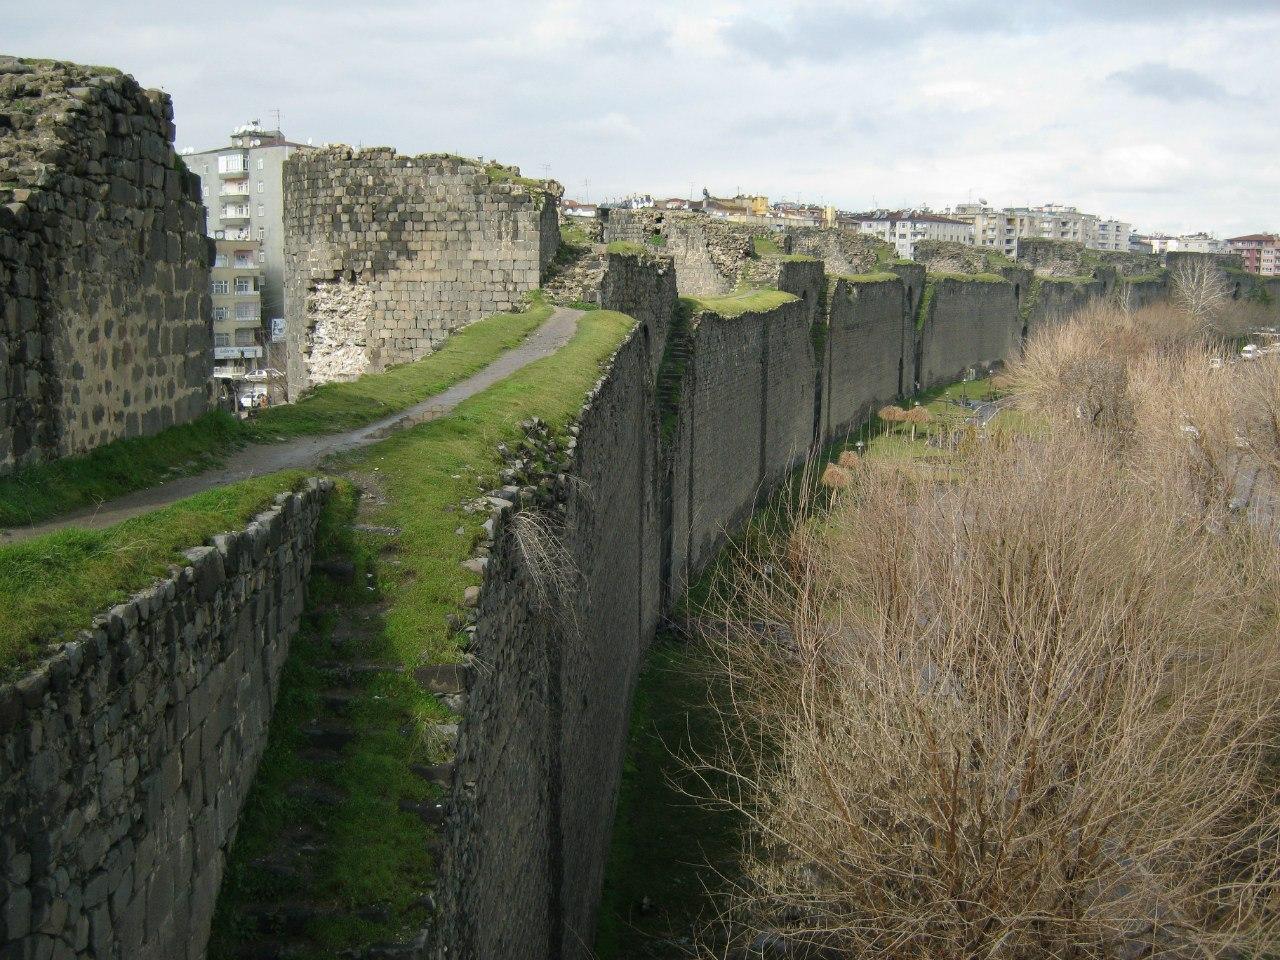 обход крепостной стены Диярбакыра